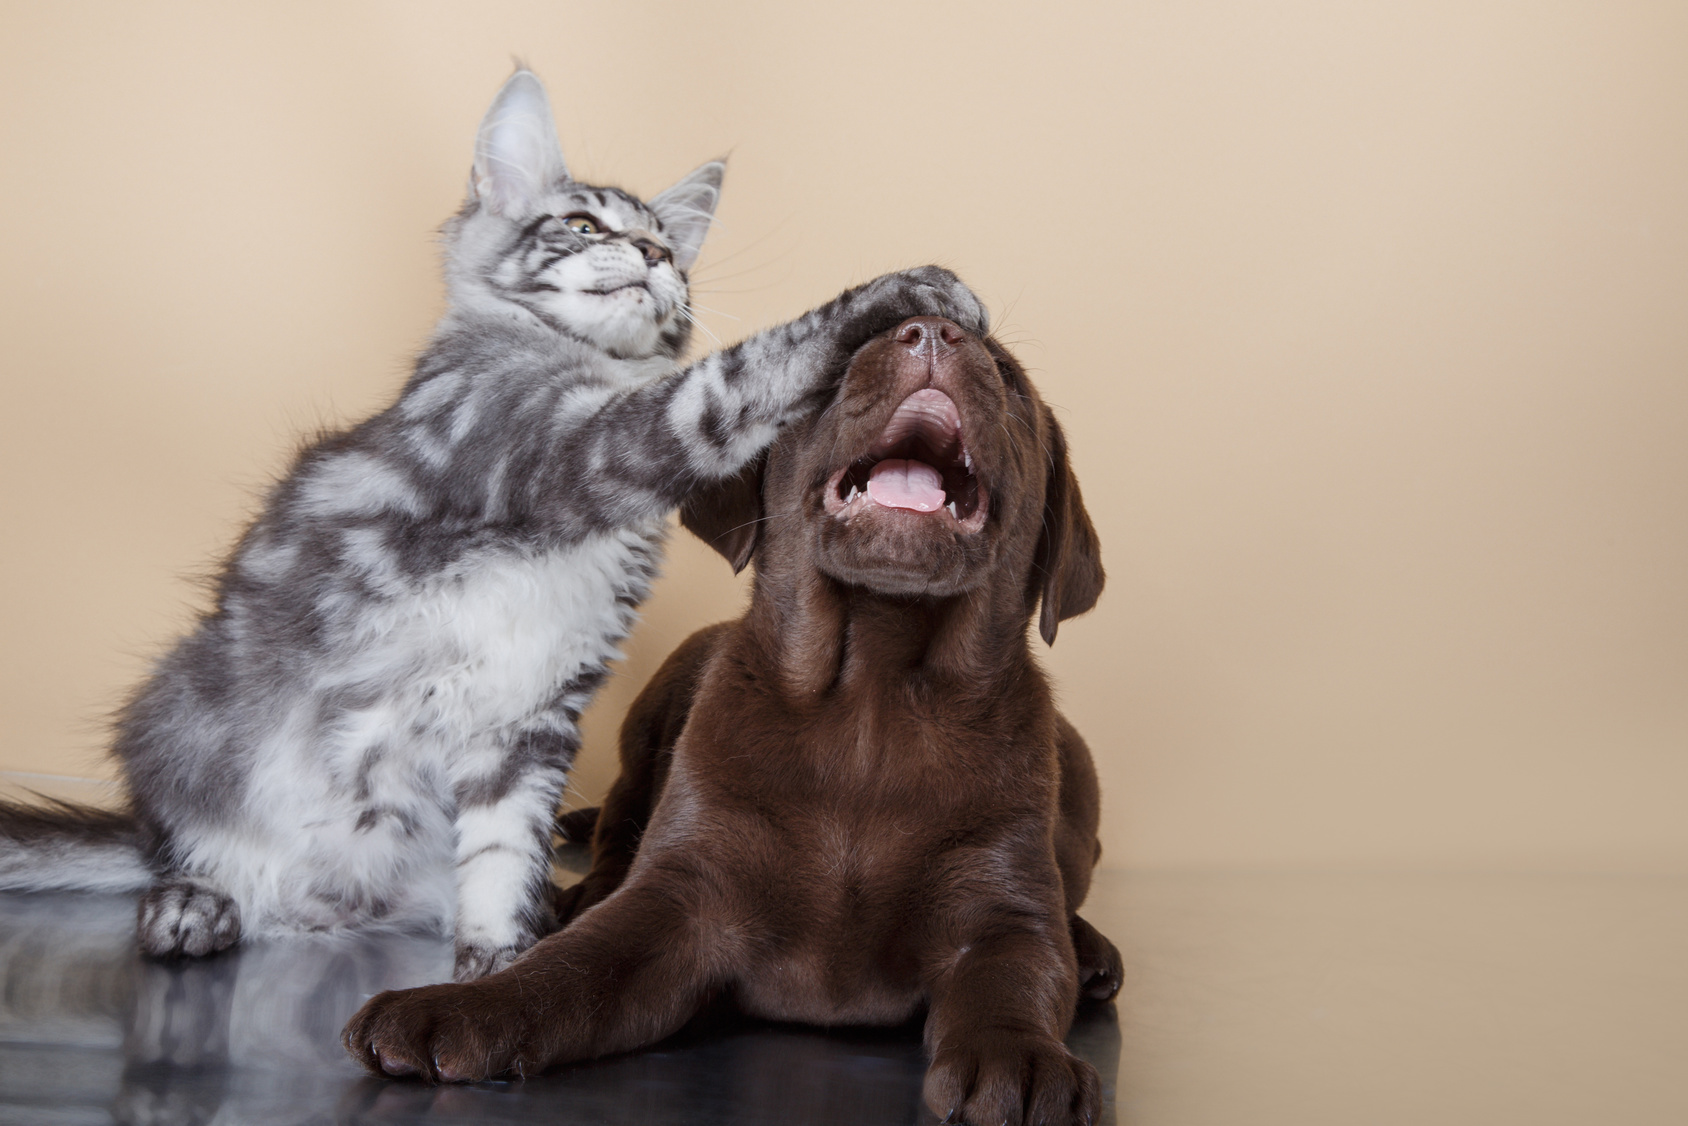 Blog cani : Notizie cani, news sui cani